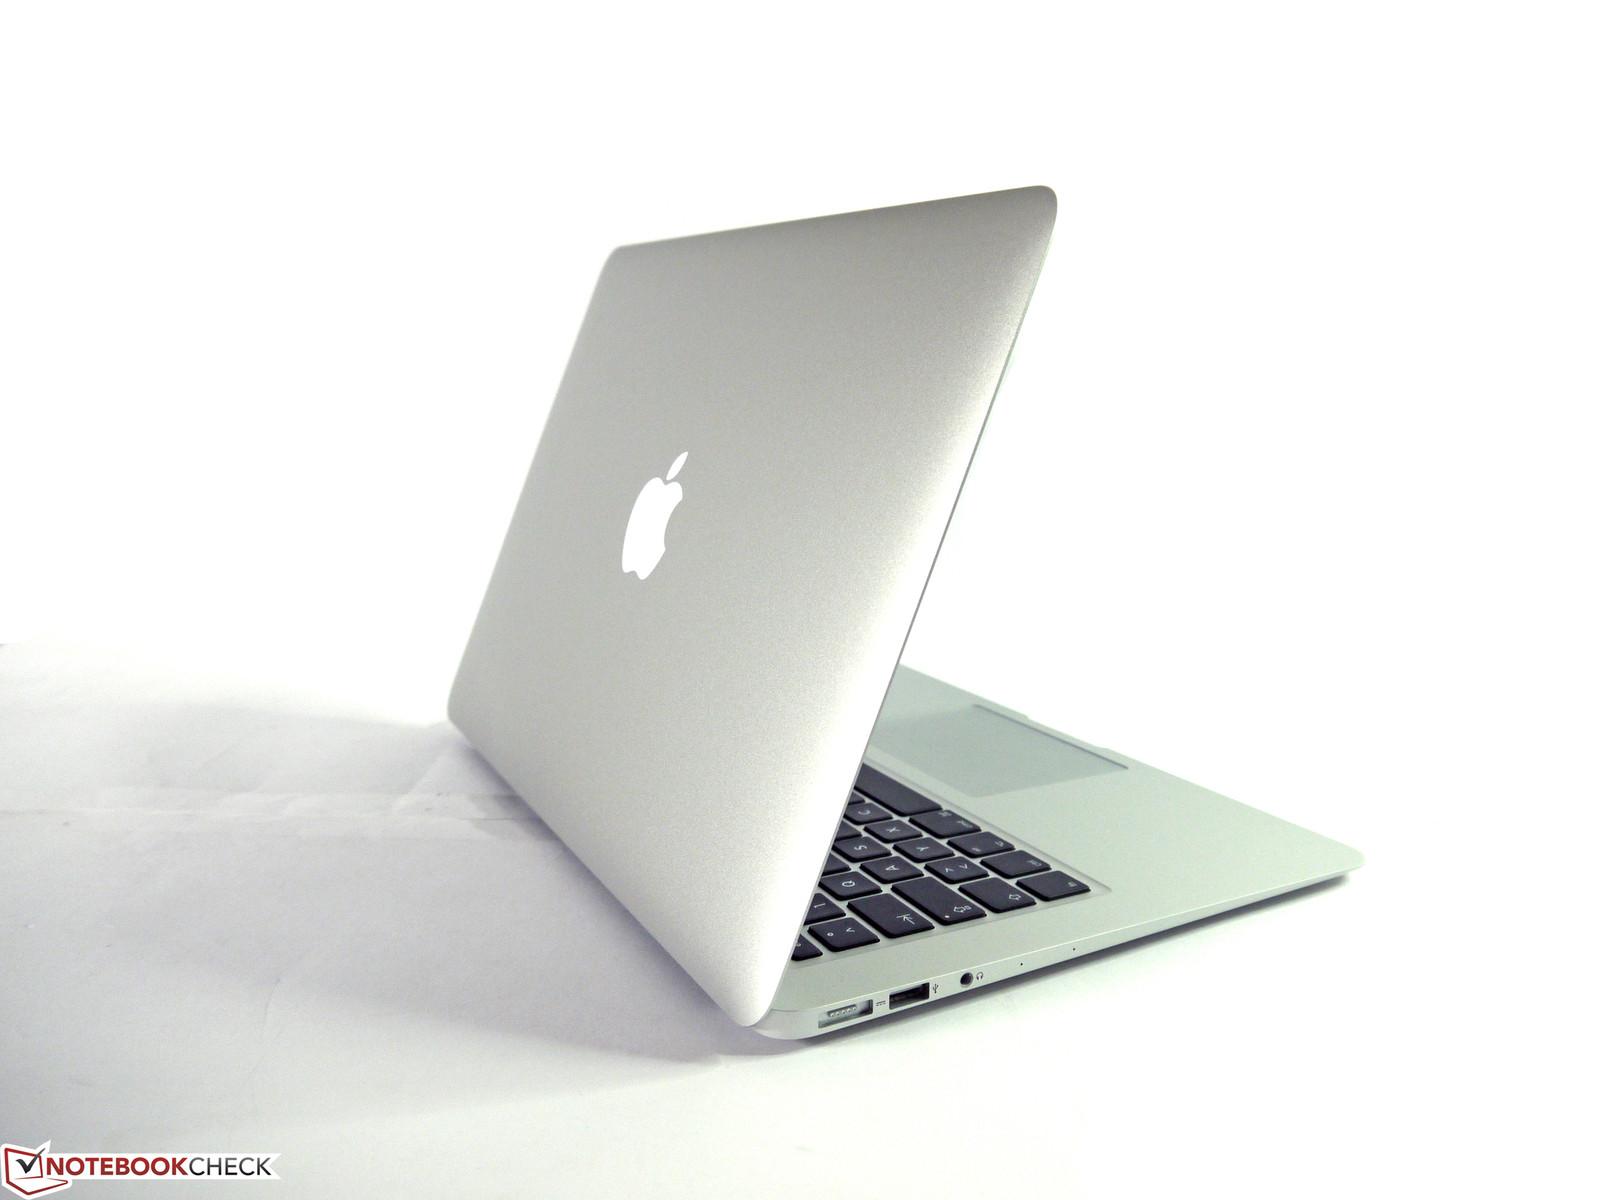 apple macbook air 13 2015 notebook review reviews. Black Bedroom Furniture Sets. Home Design Ideas